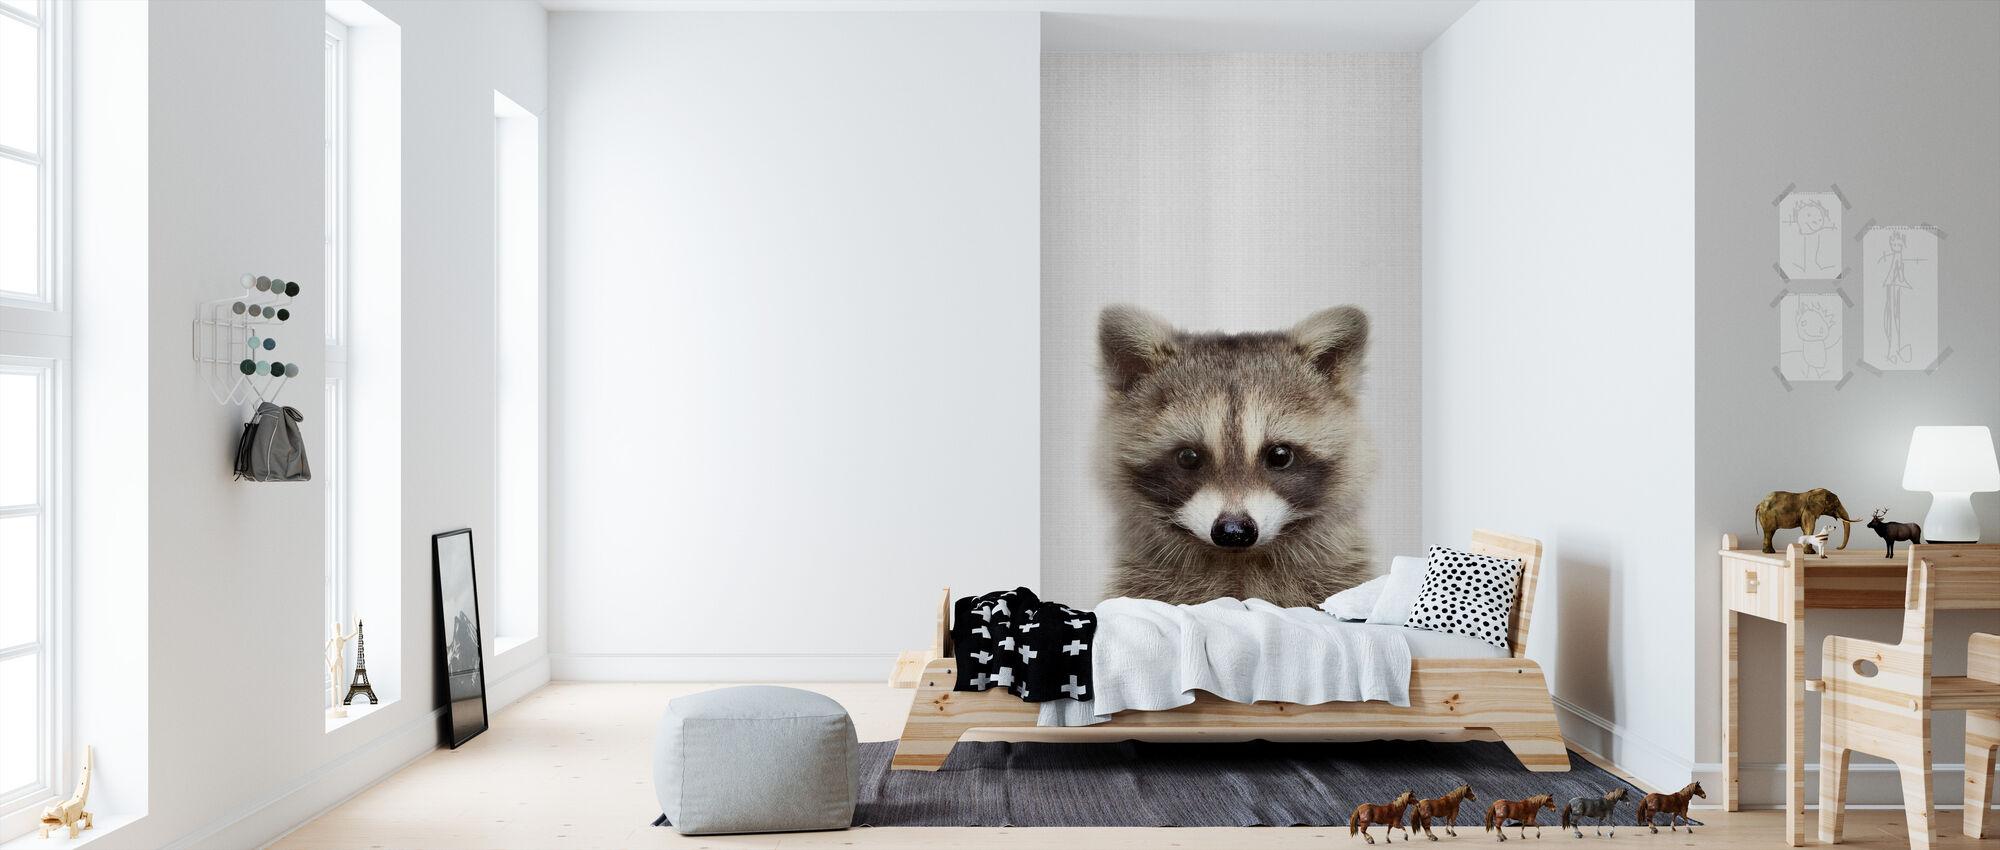 Wasbeer - Behang - Kinderkamer